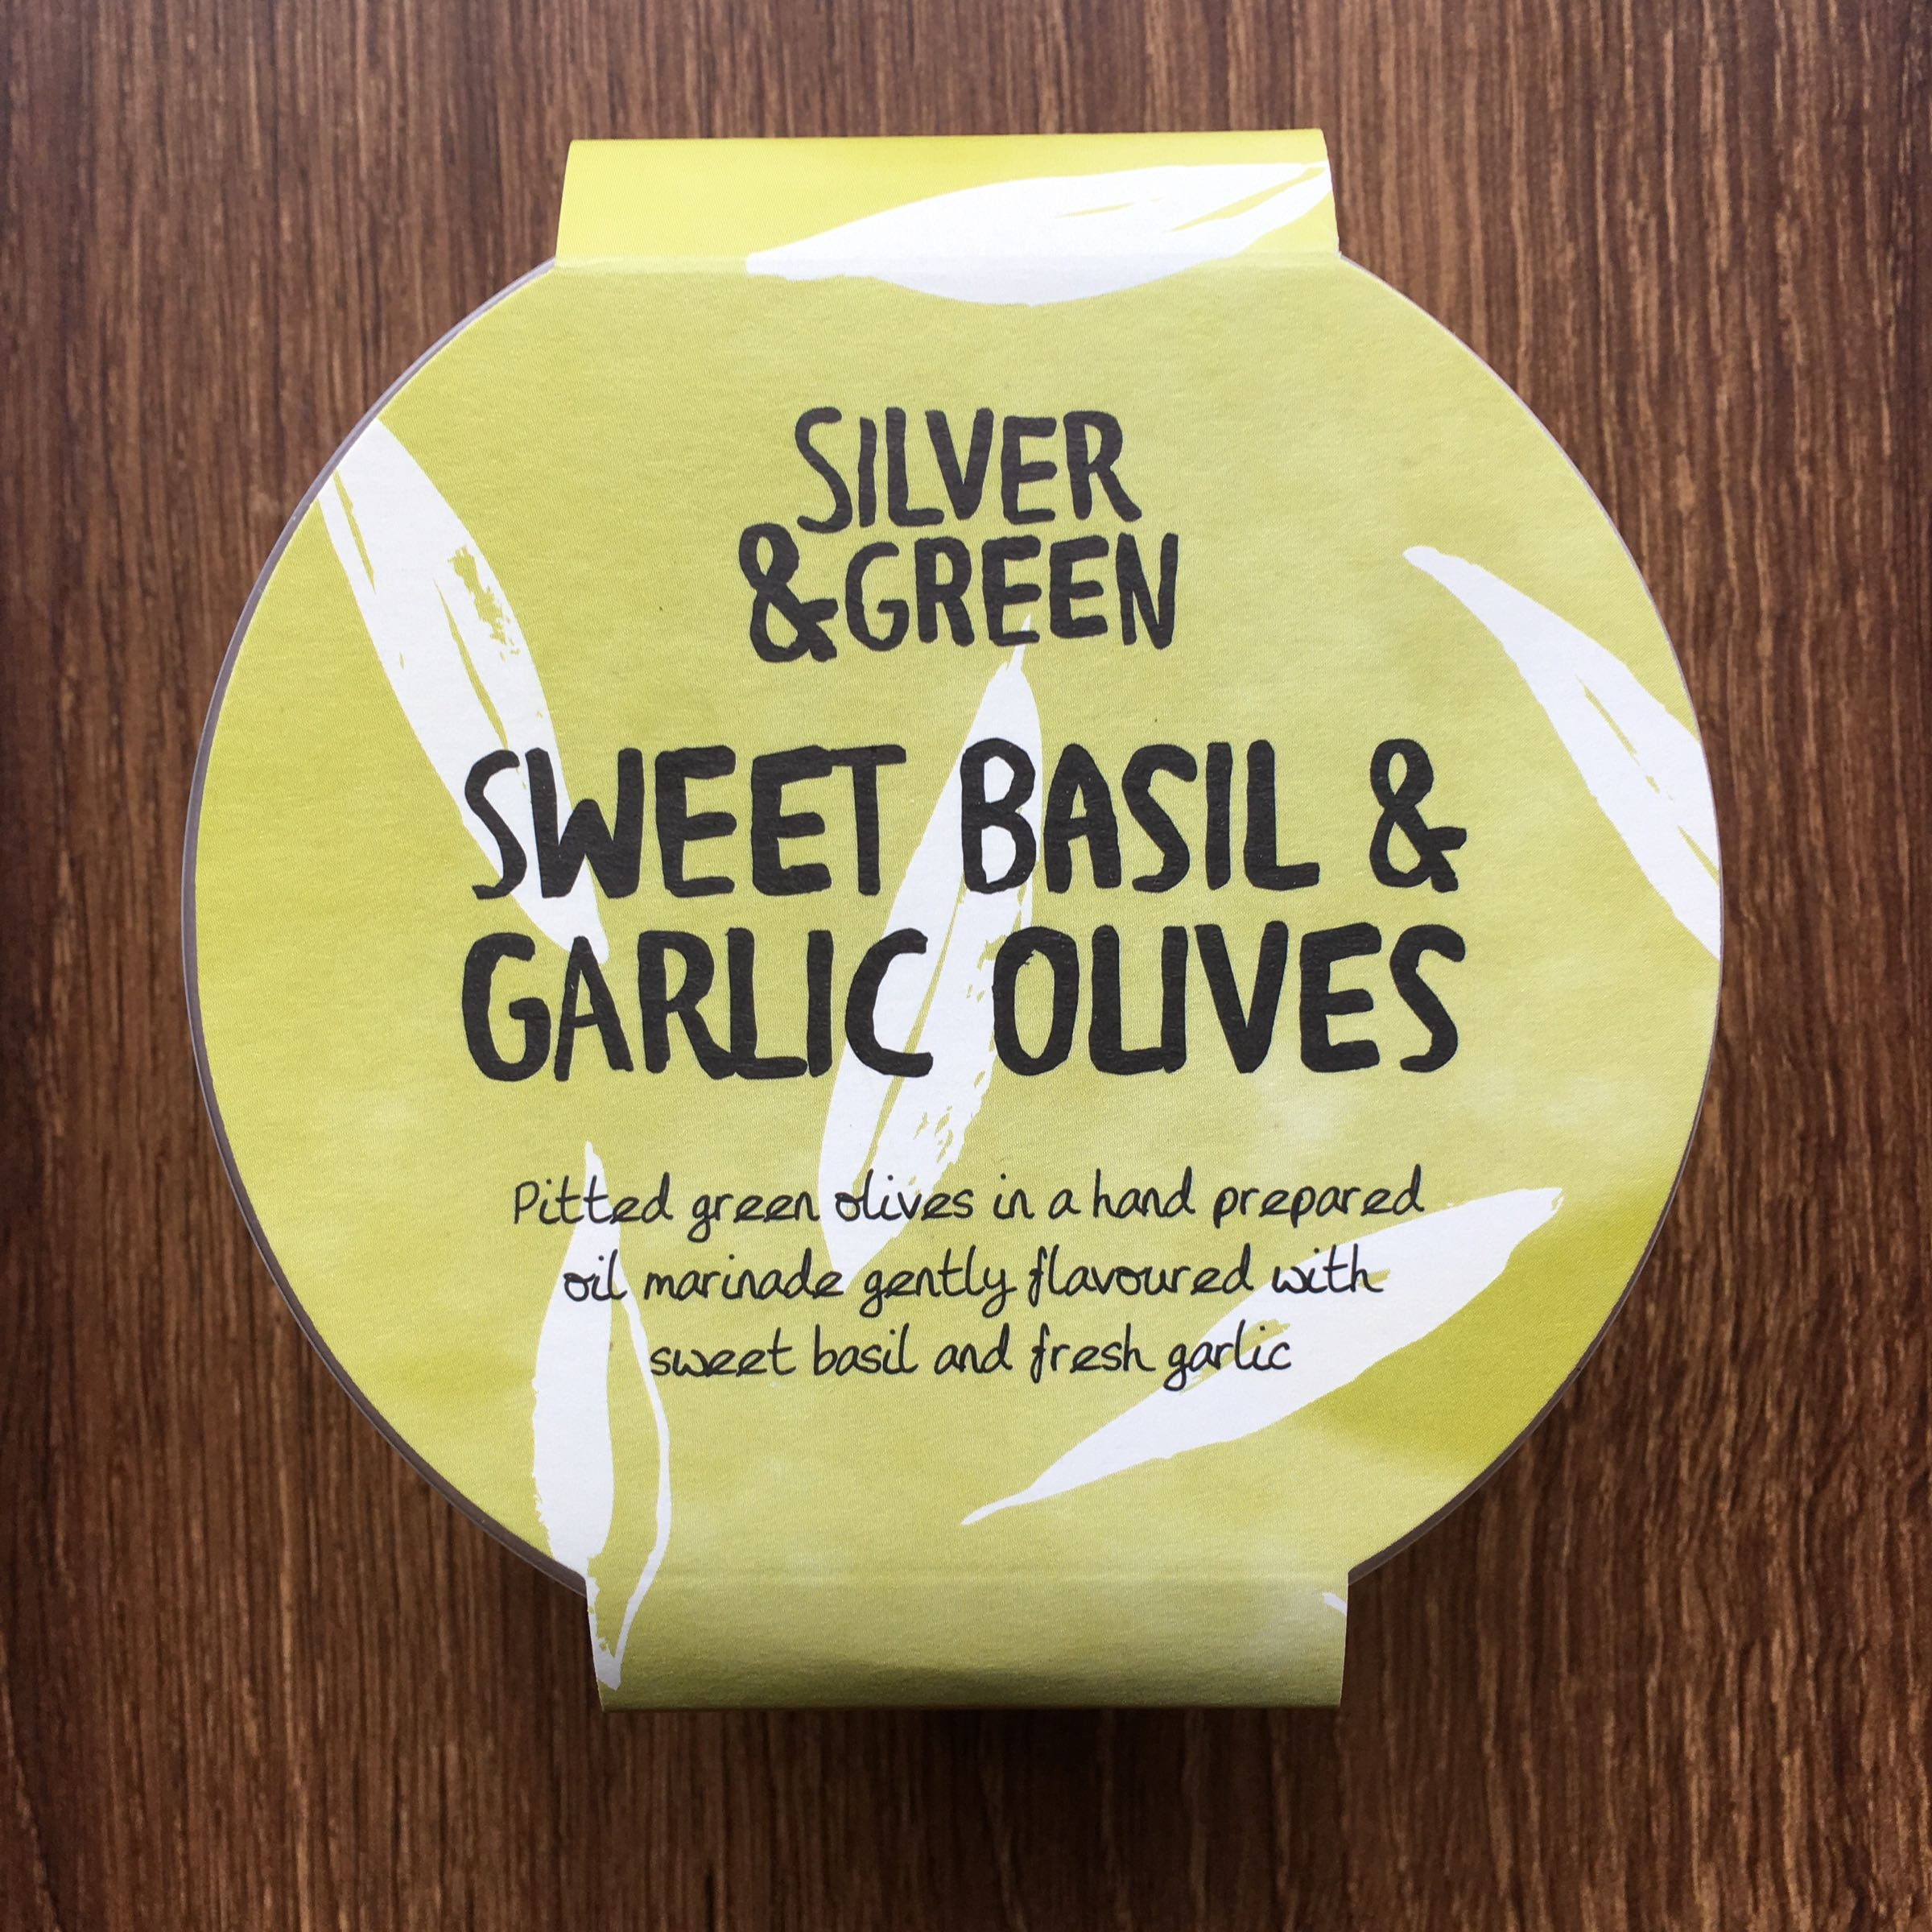 Sweet Basil & Garlic Olives